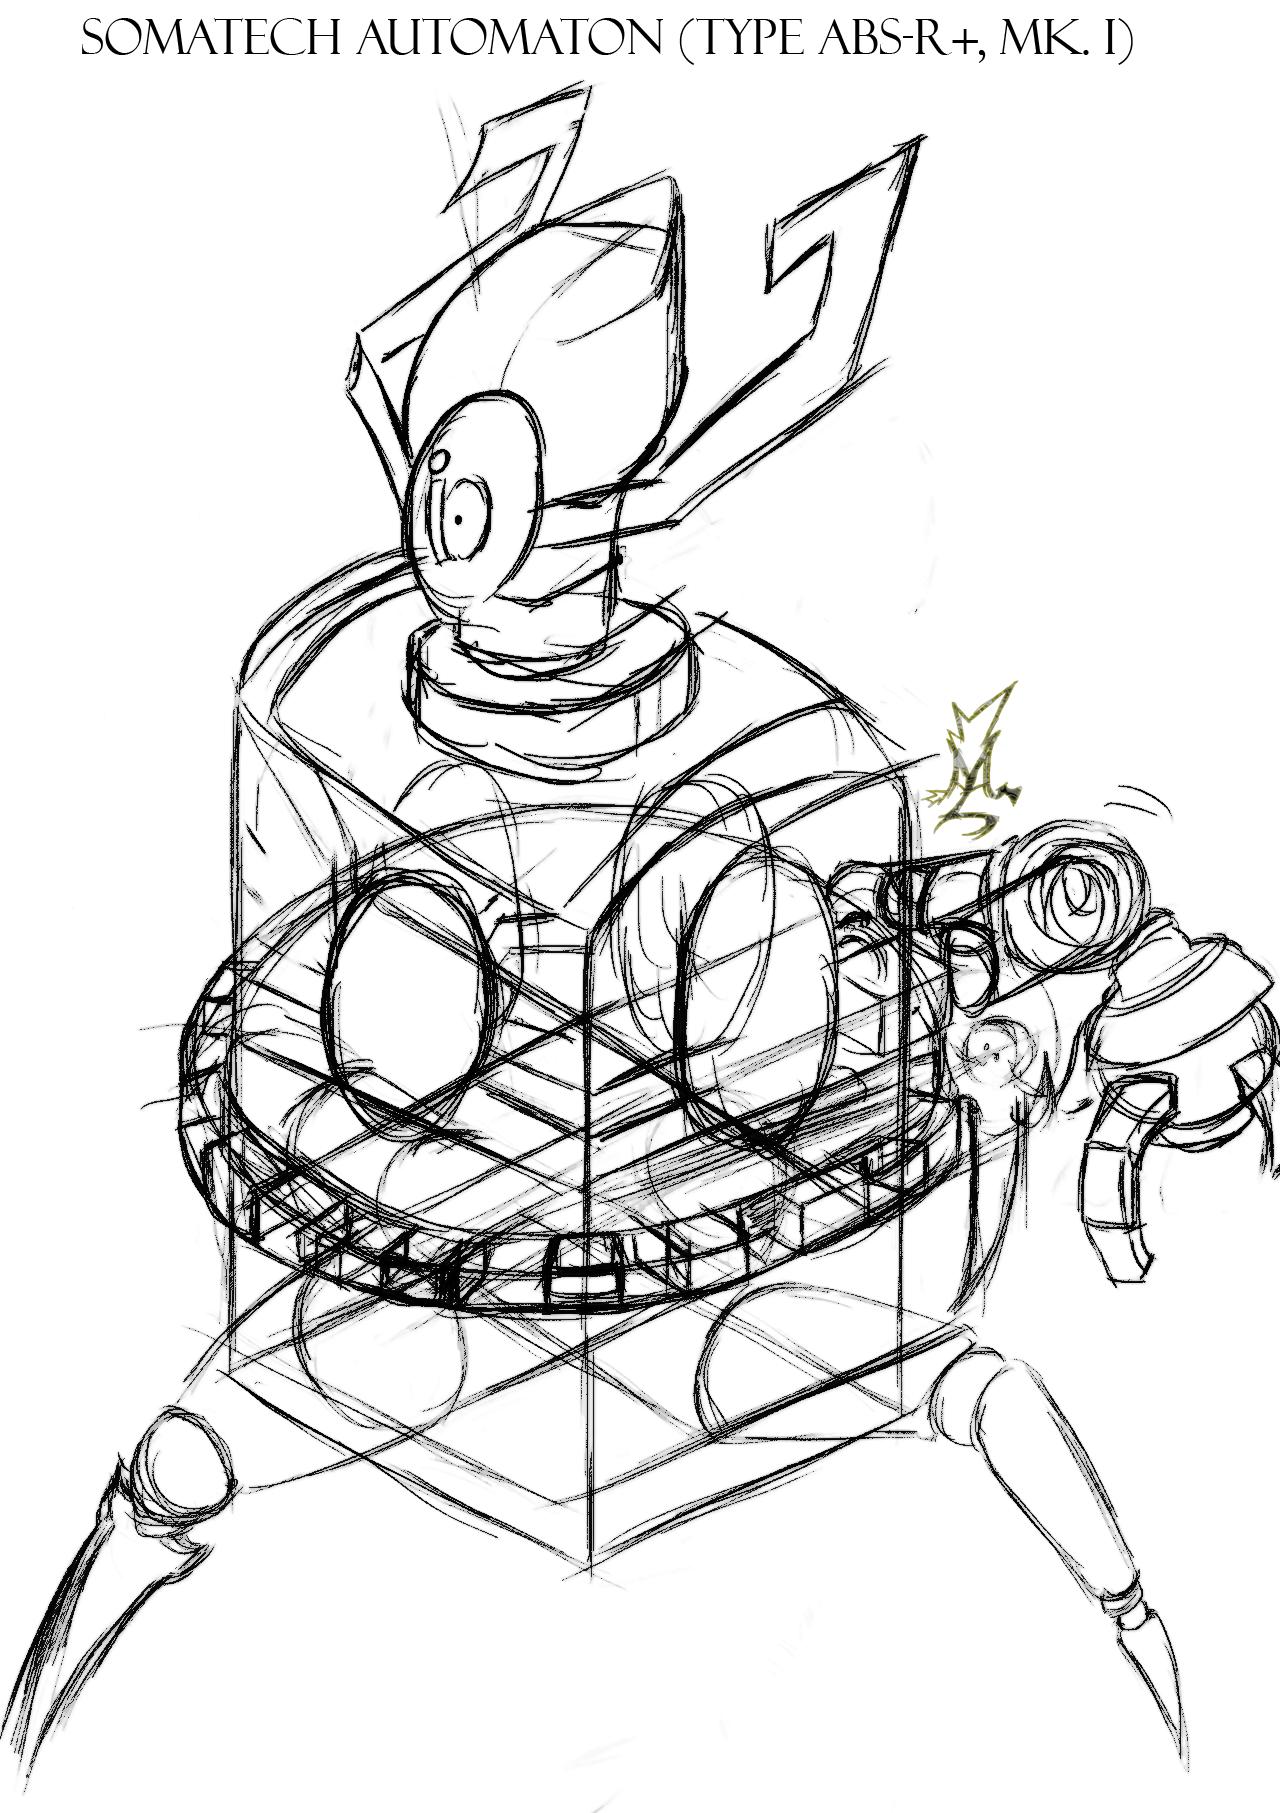 Magichaos Campus - The Somautomaton (Sketch)